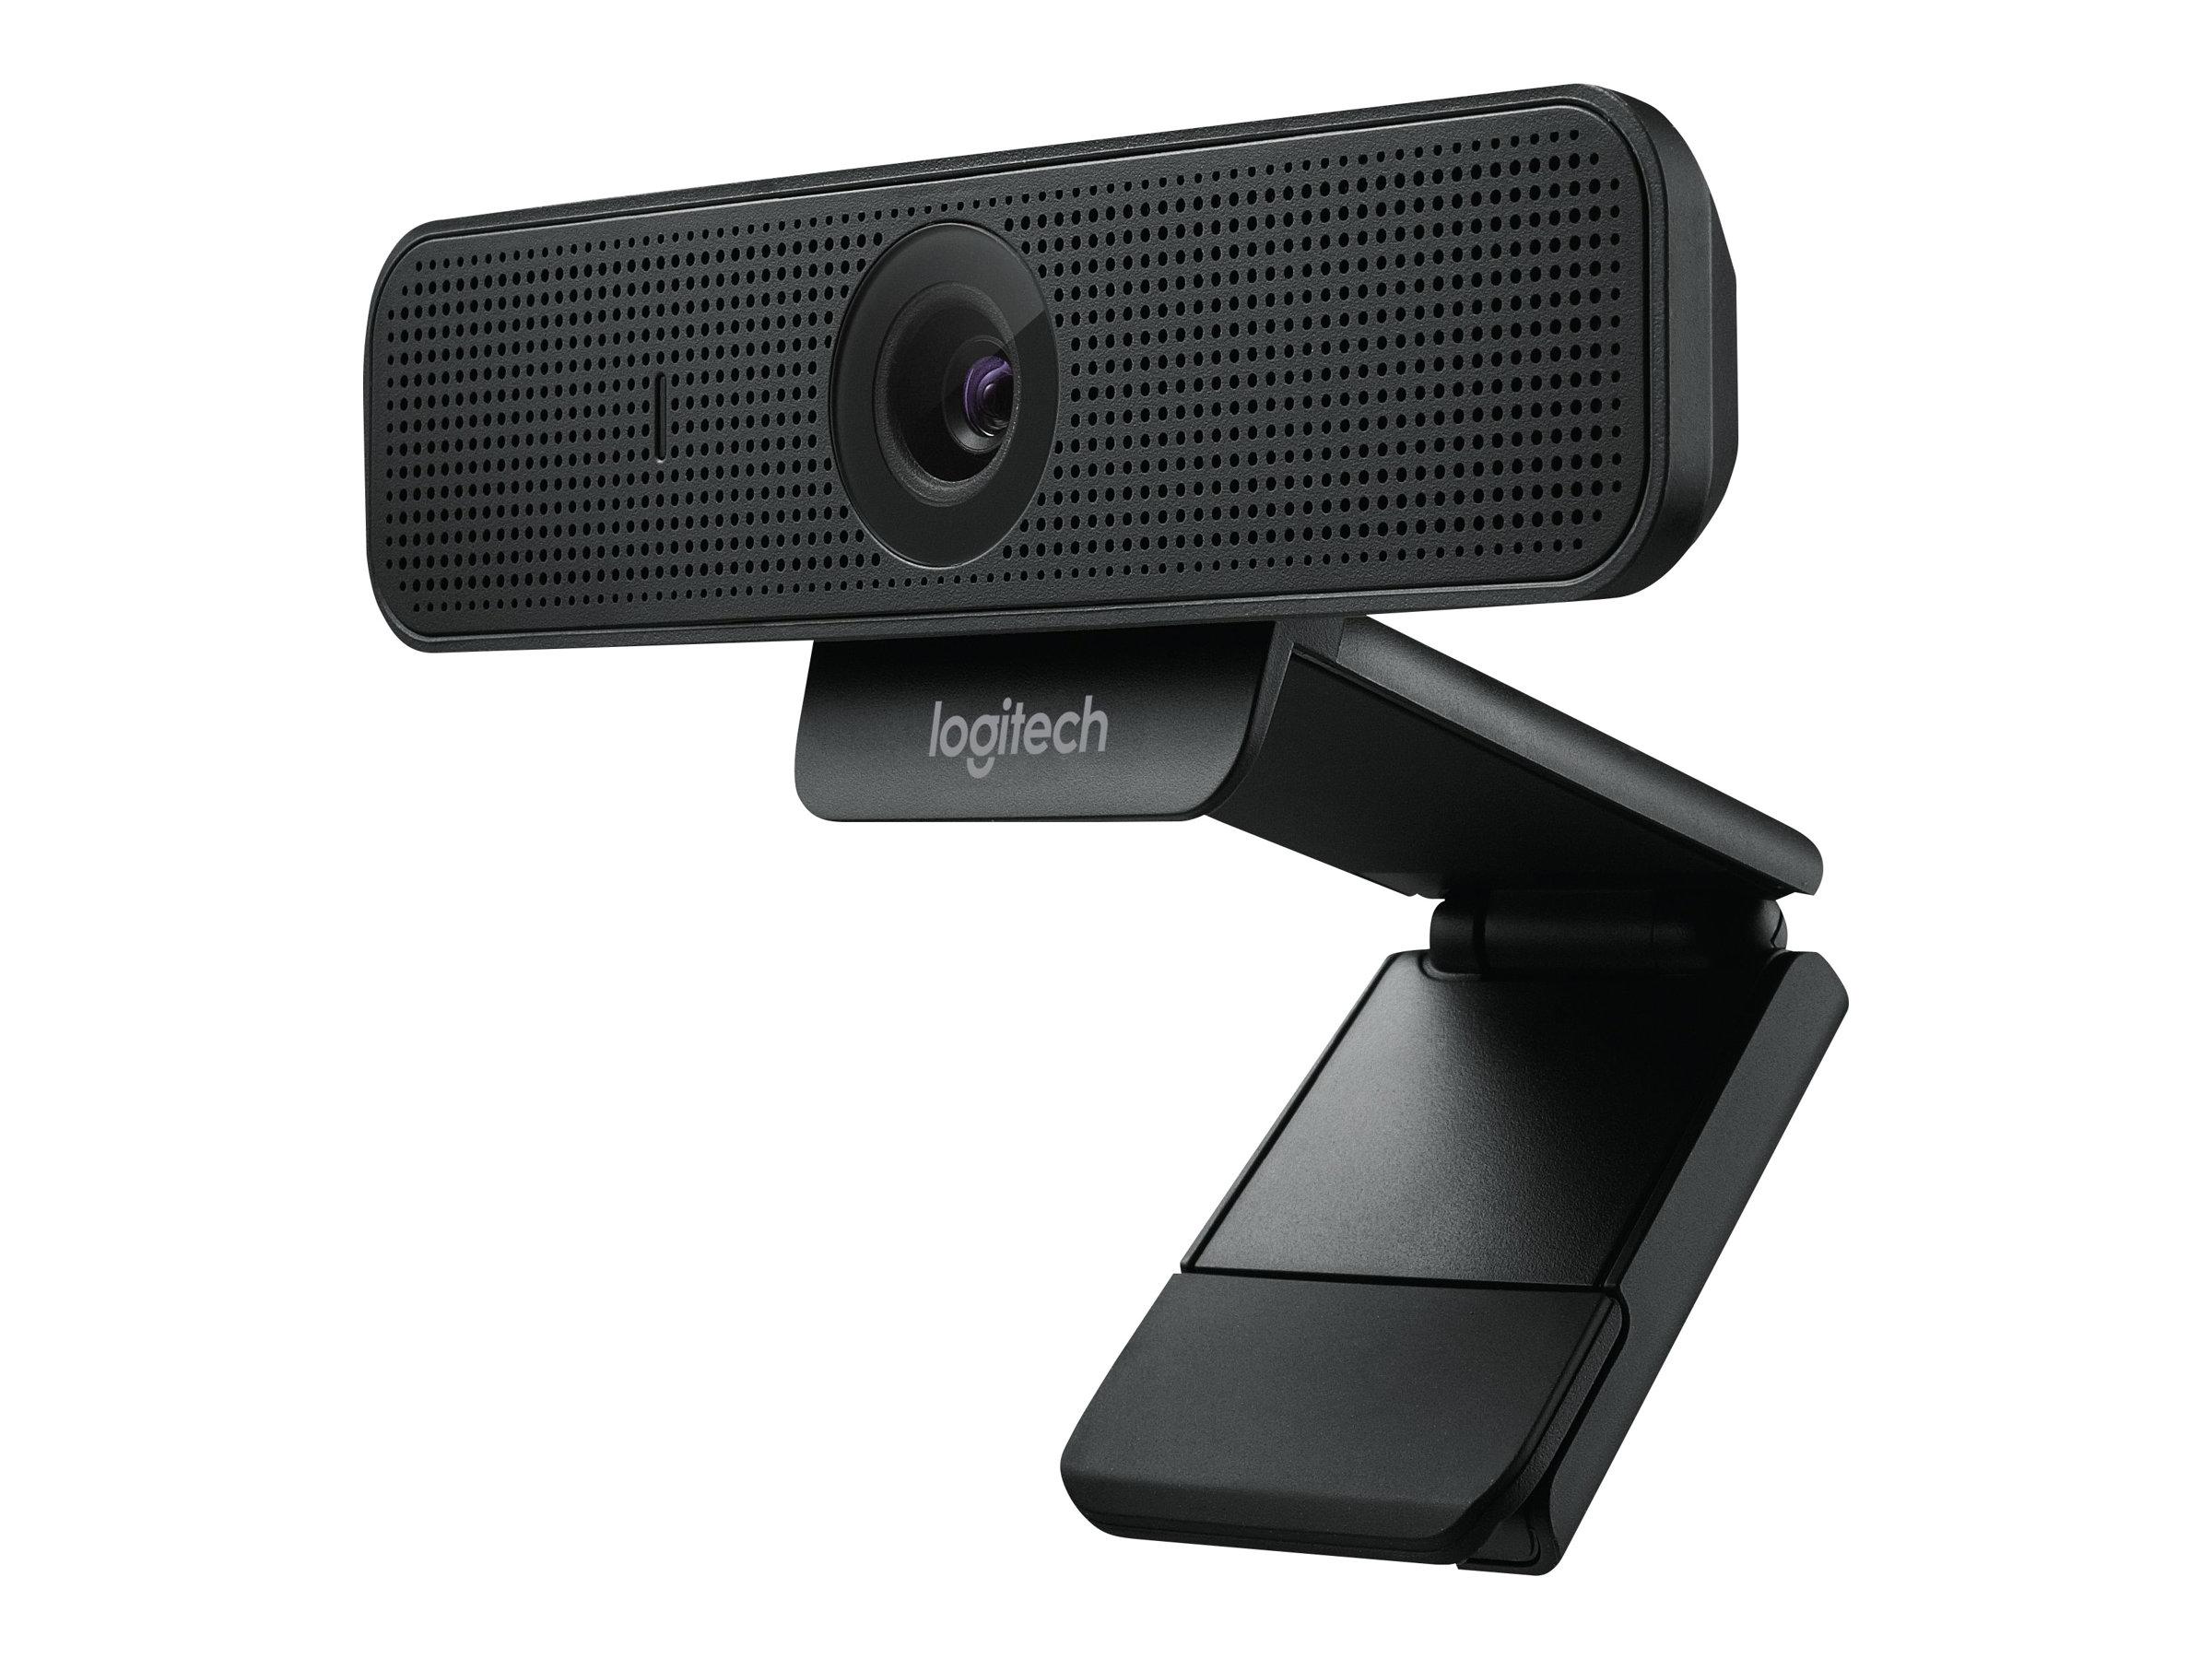 Logitech Webcam C925e - Web-Kamera - Farbe - 1920 x 1080